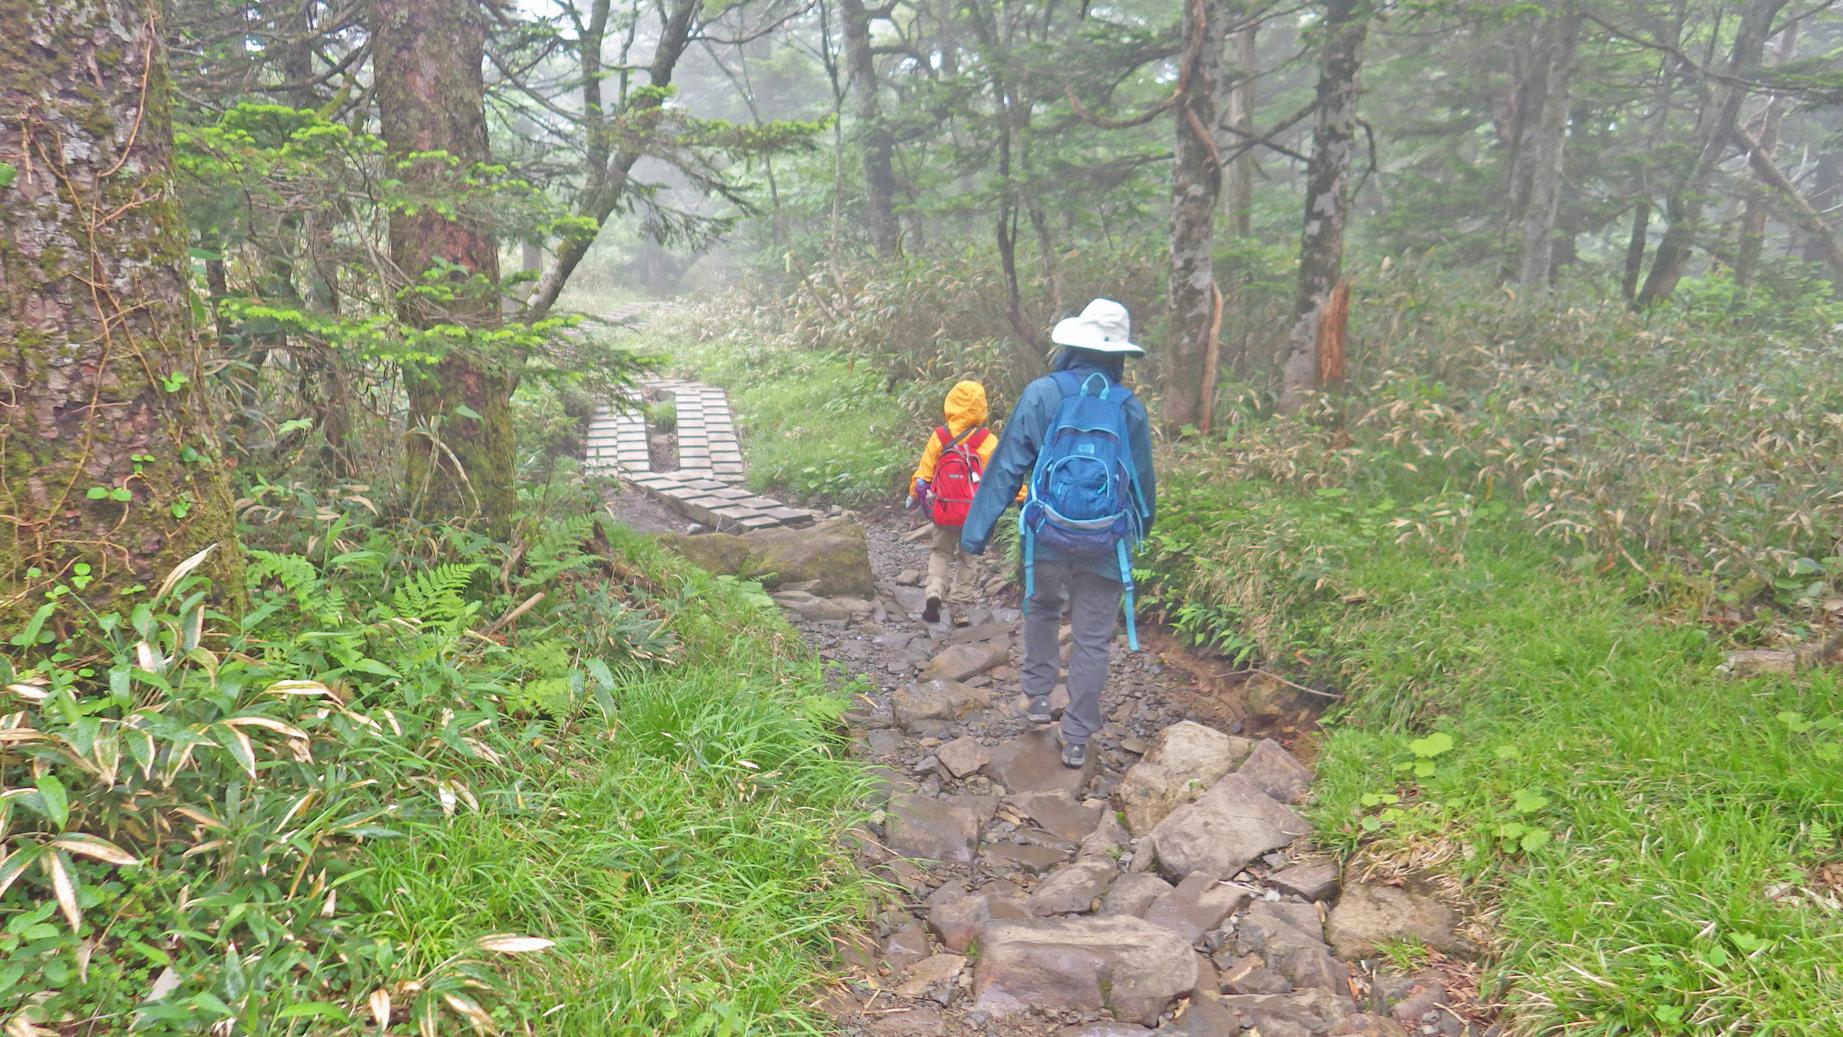 早池峰山の樹林帯